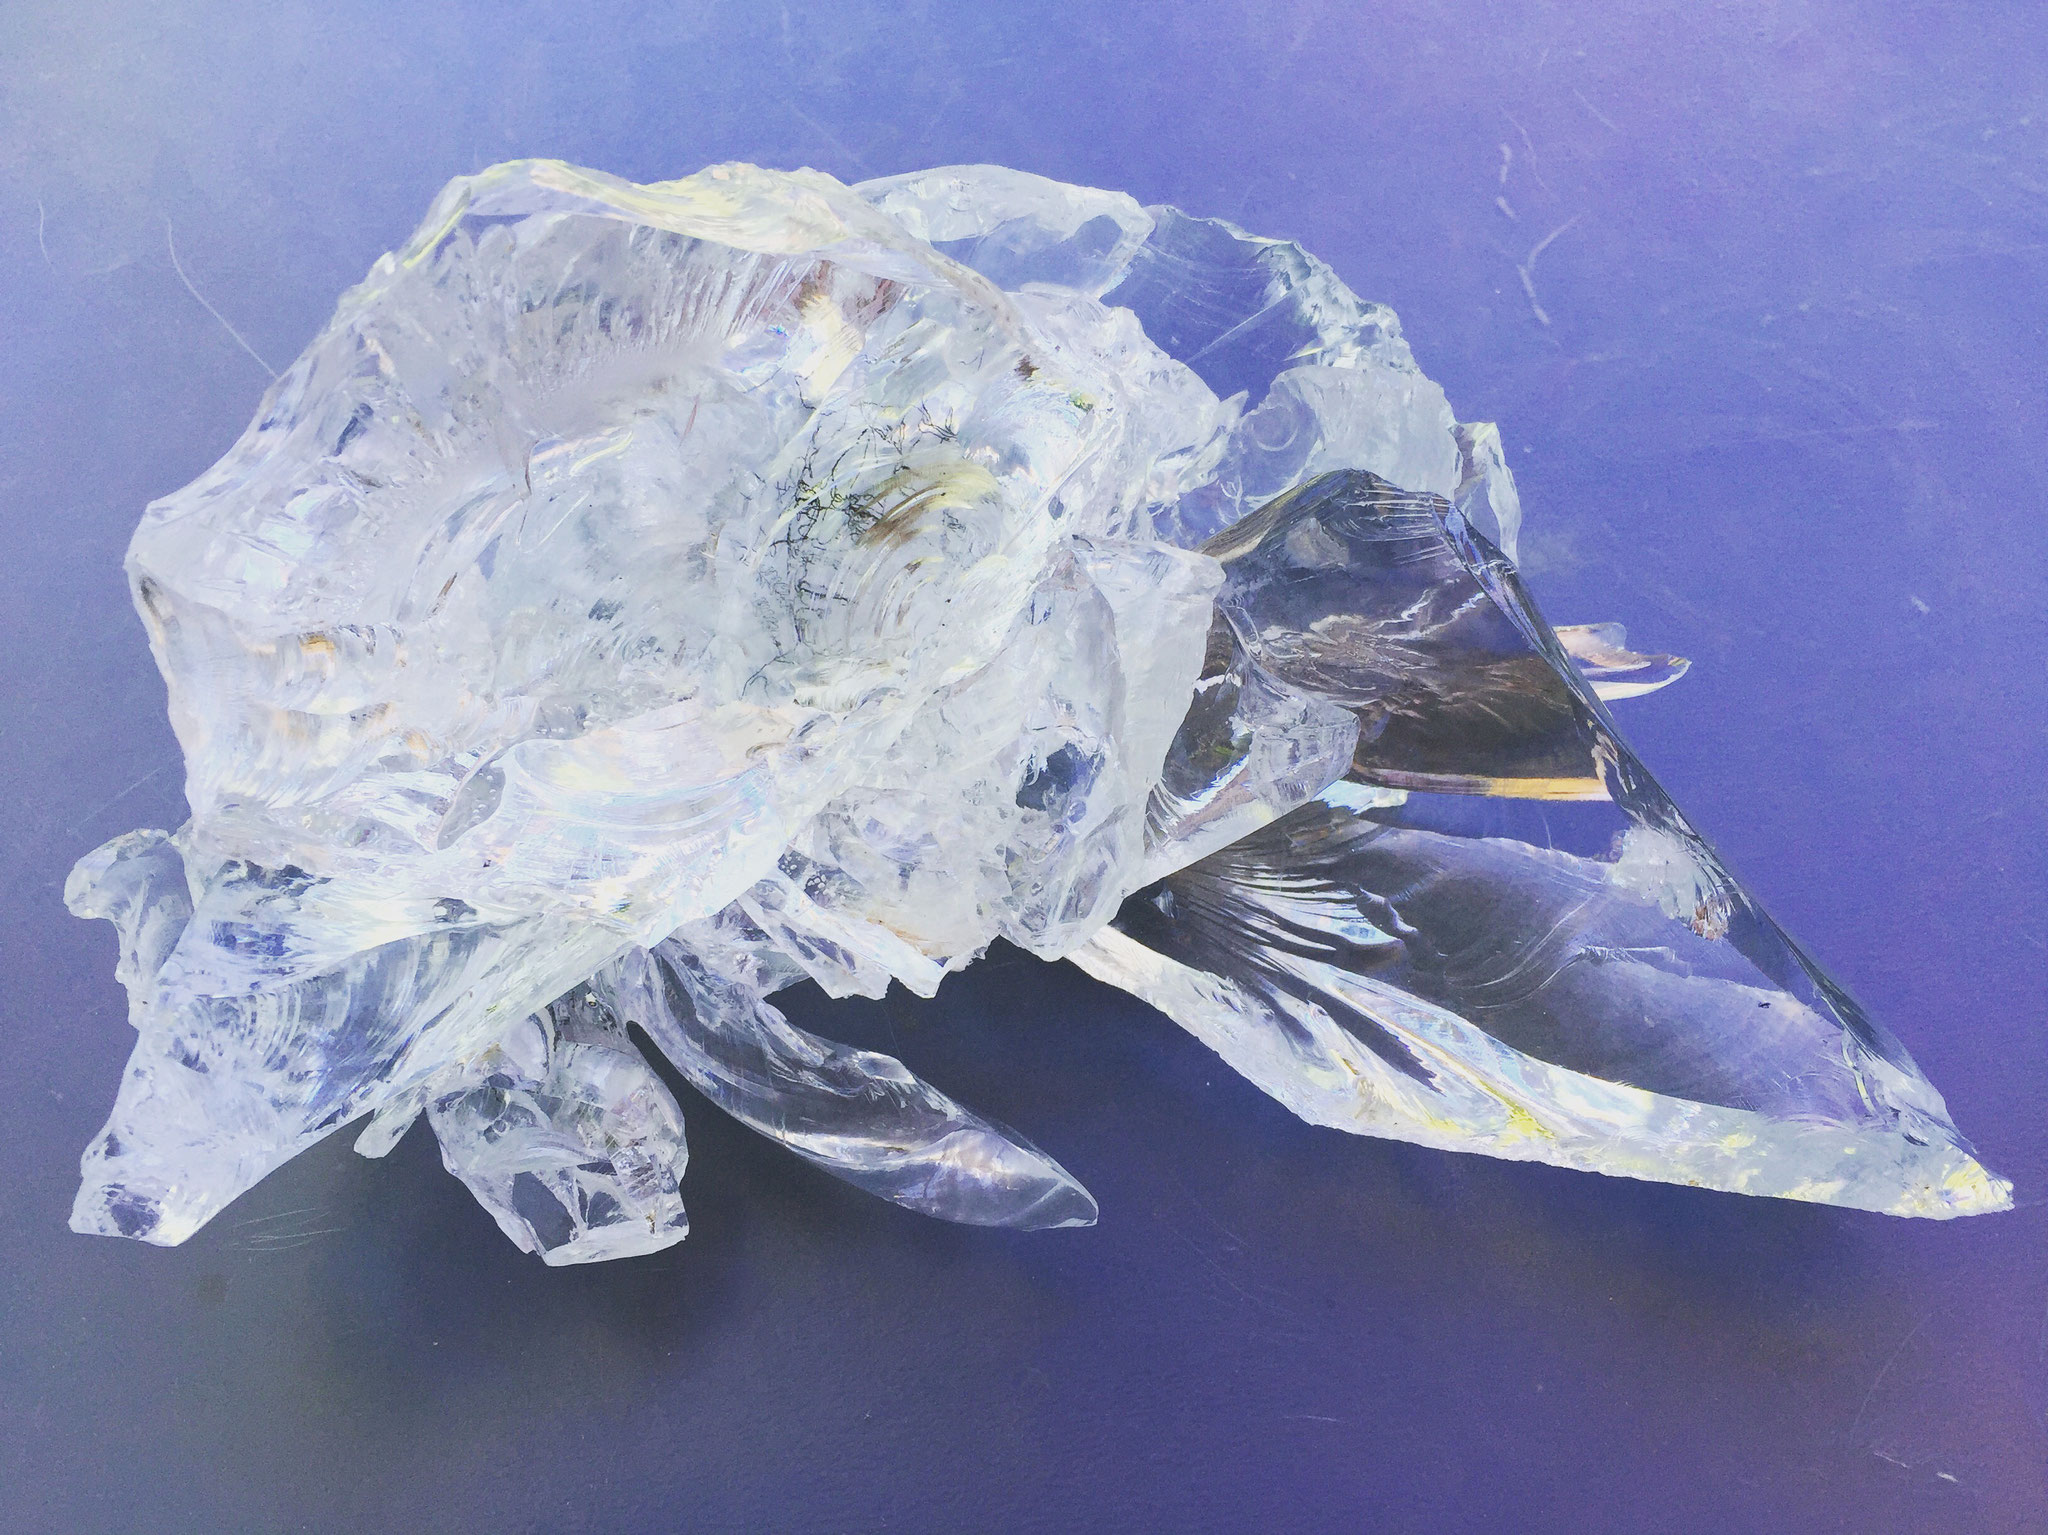 very small inclusions, Objekt aus Glassplitter, 2016, Damaris Rohner